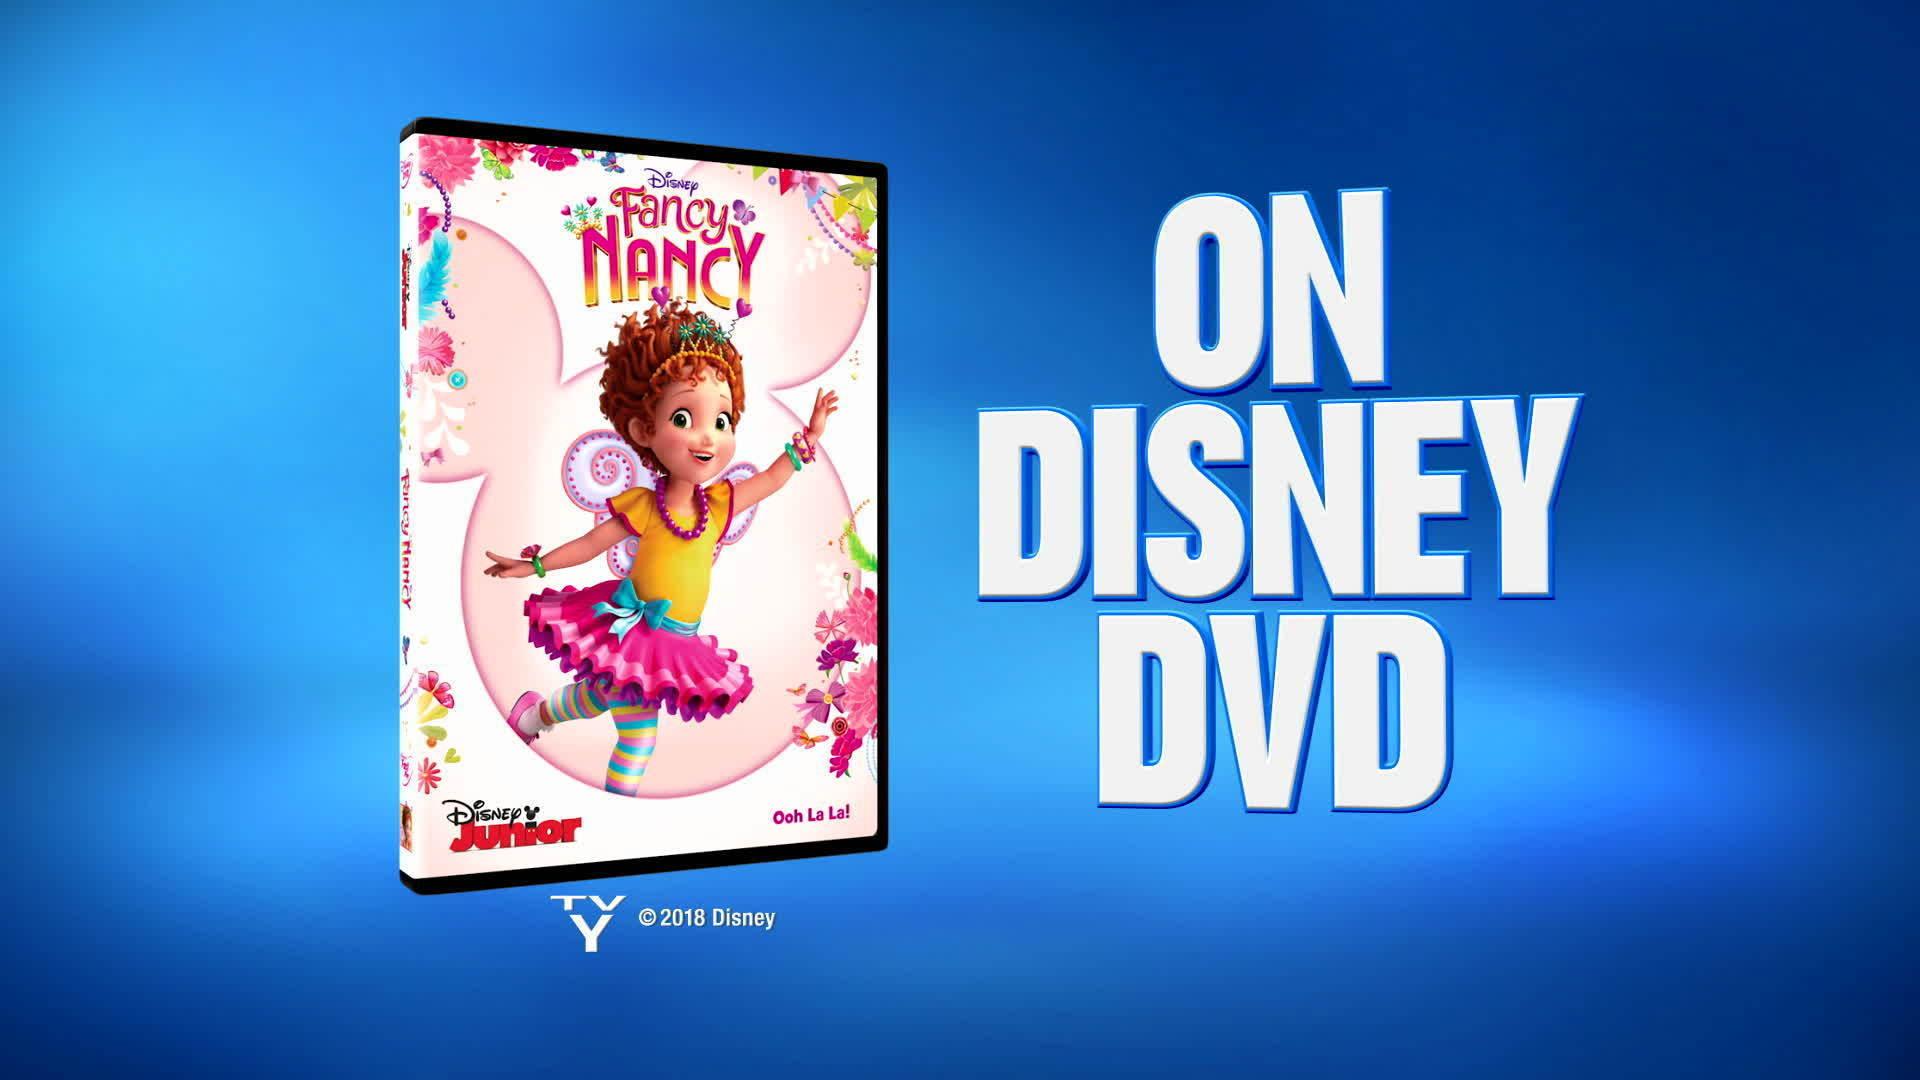 Fancy Nancy | Now Available On Disney DVD